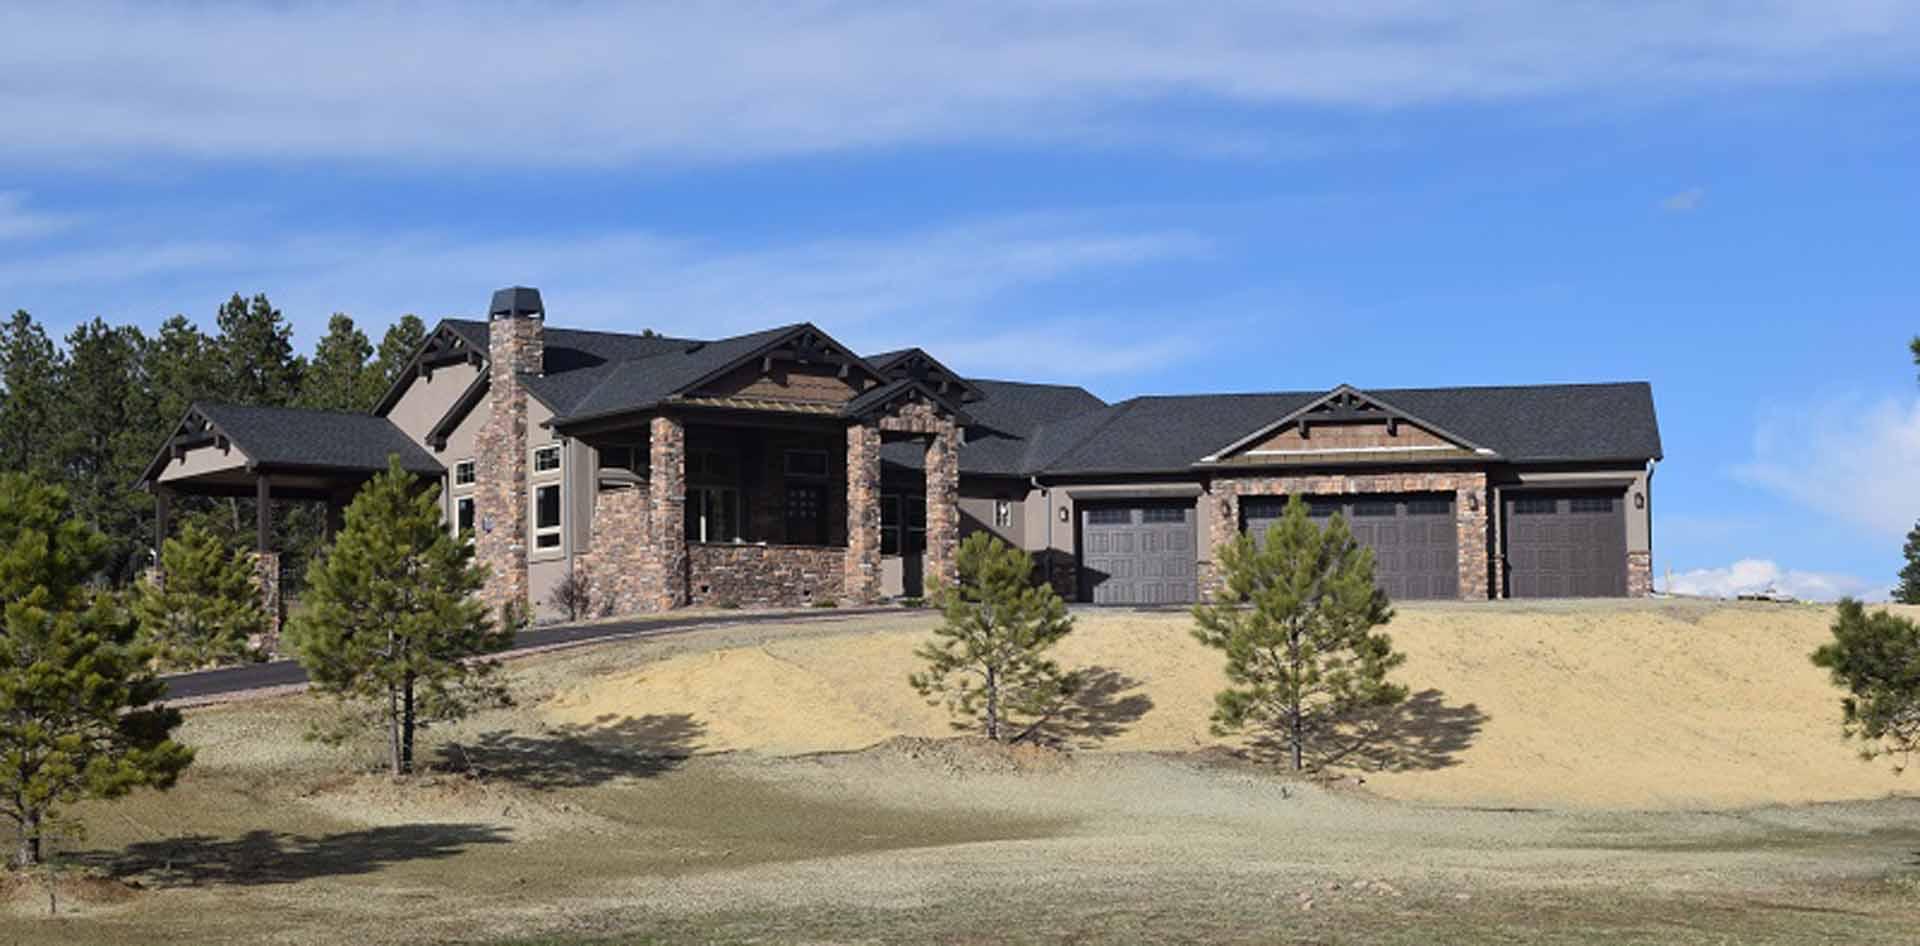 Uncategorized ada homes in colorado springs floor plans - Map Data